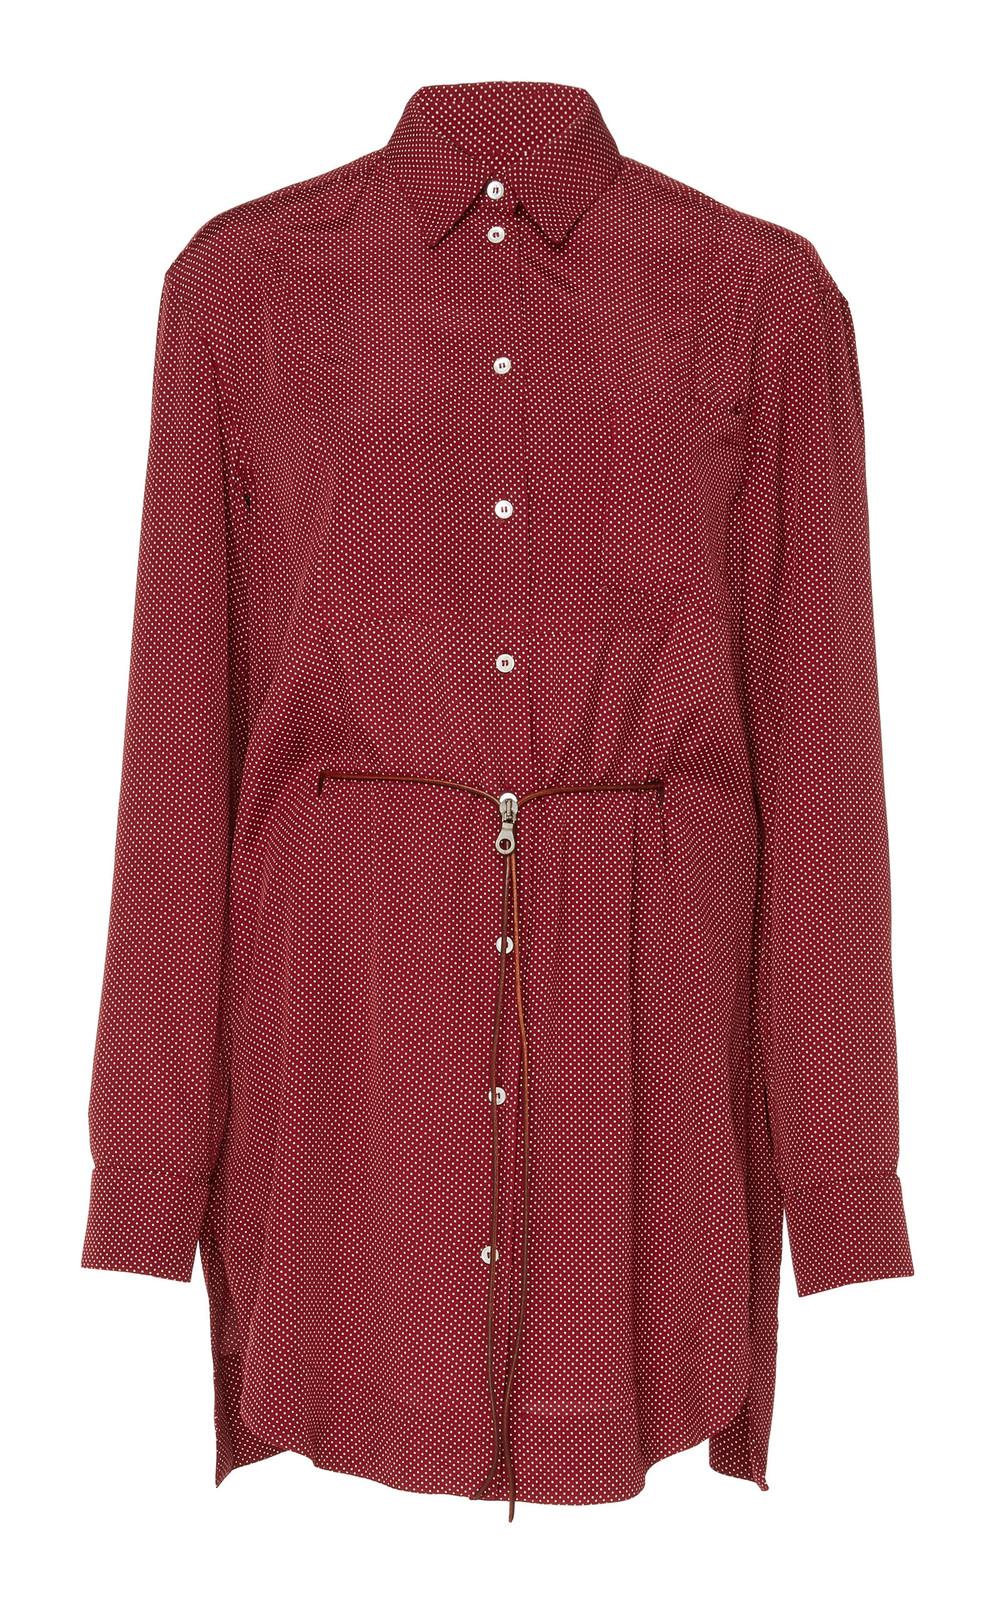 Tre by Natalie Ratabesi Scarlet Silk-Blend Tunic in burgundy